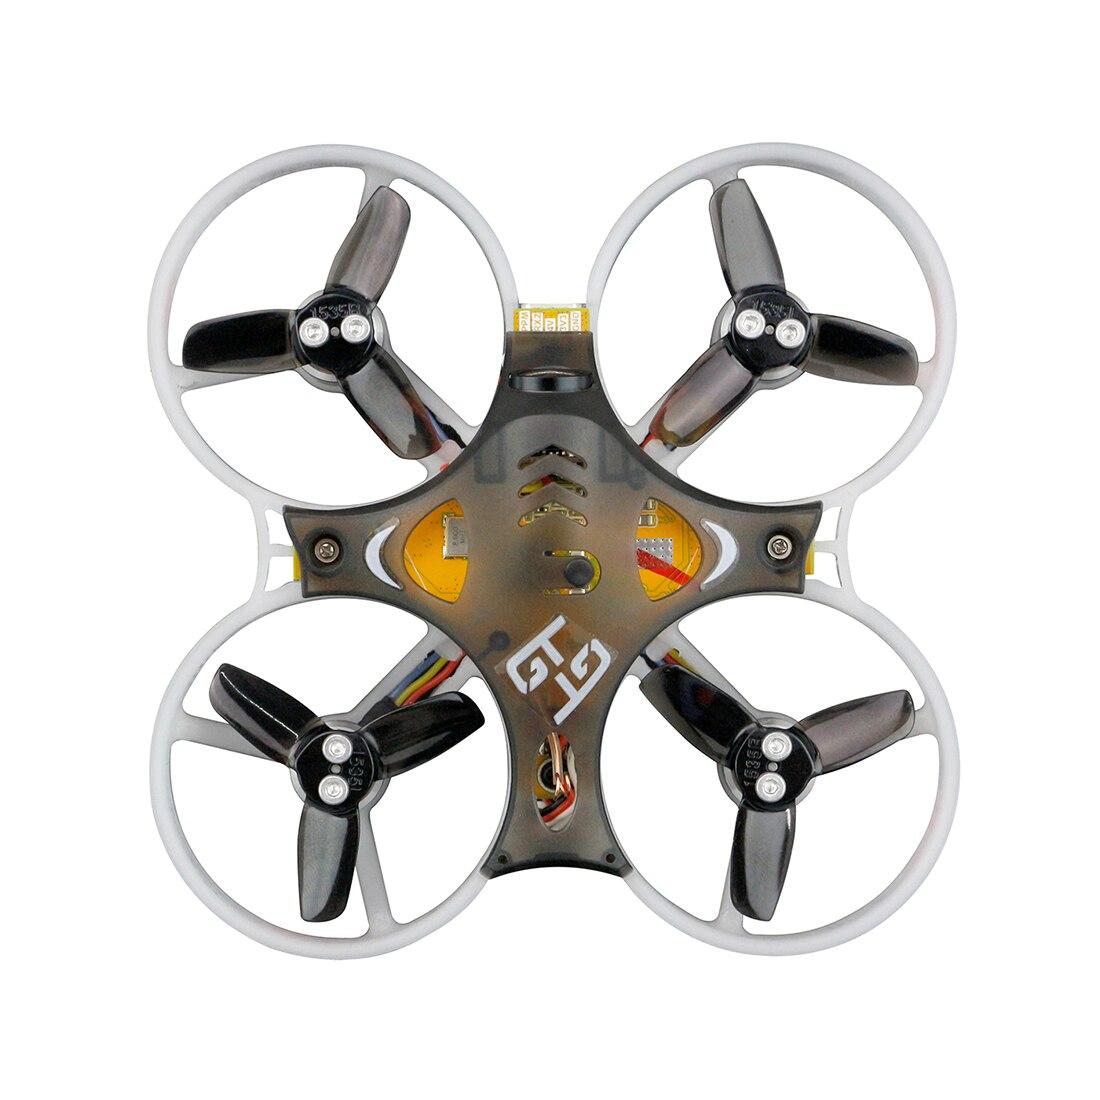 LDARC TINY GT7 75mm / GT8 87.6mm Mini FPV RC Racing Drone Copter Betaflight F3 10A Blheli_S 800TVL Cam 5.8G 25mW VTX 2S PNP BNF